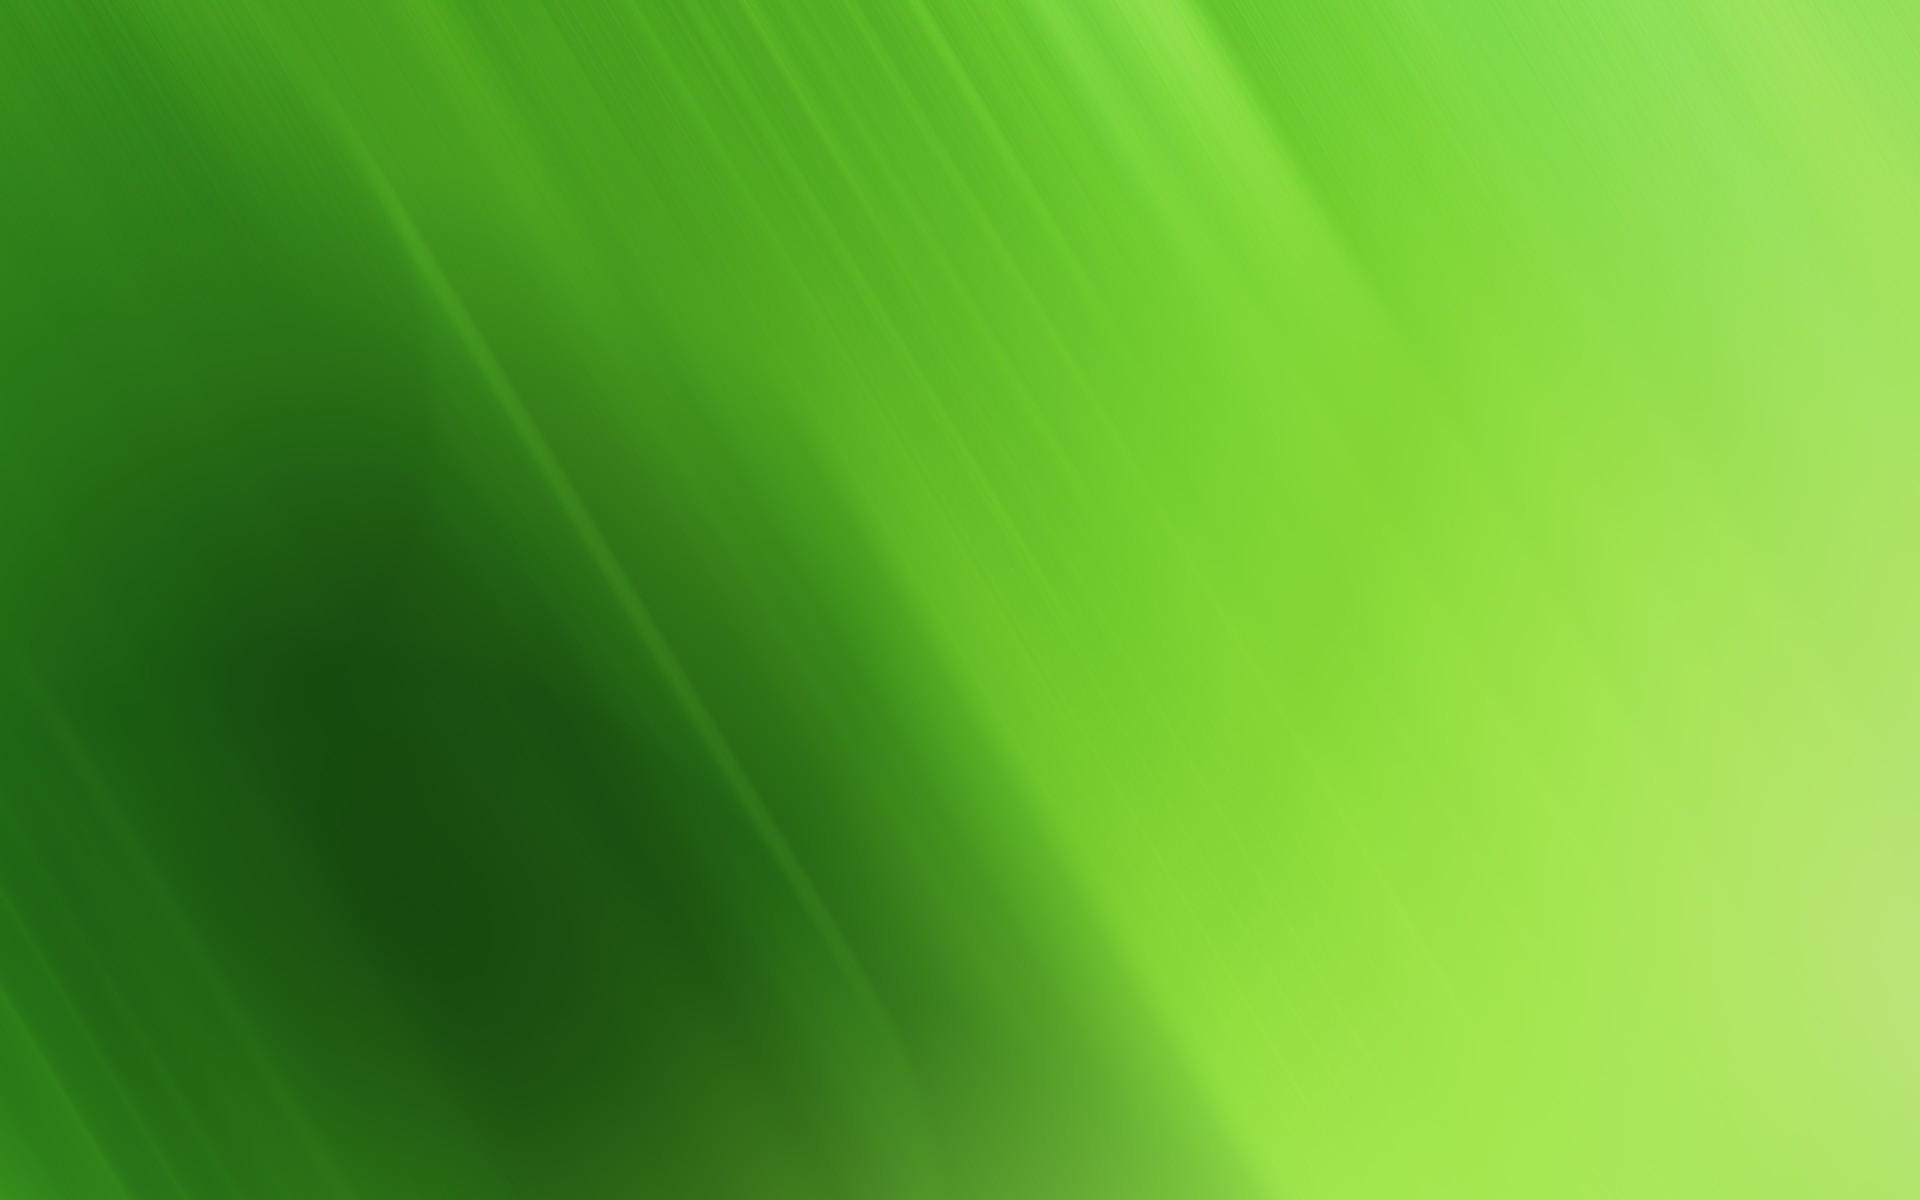 Res: 1920x1200, Wallpaper Green, Matt, Solid, Bright HD, Picture, Image